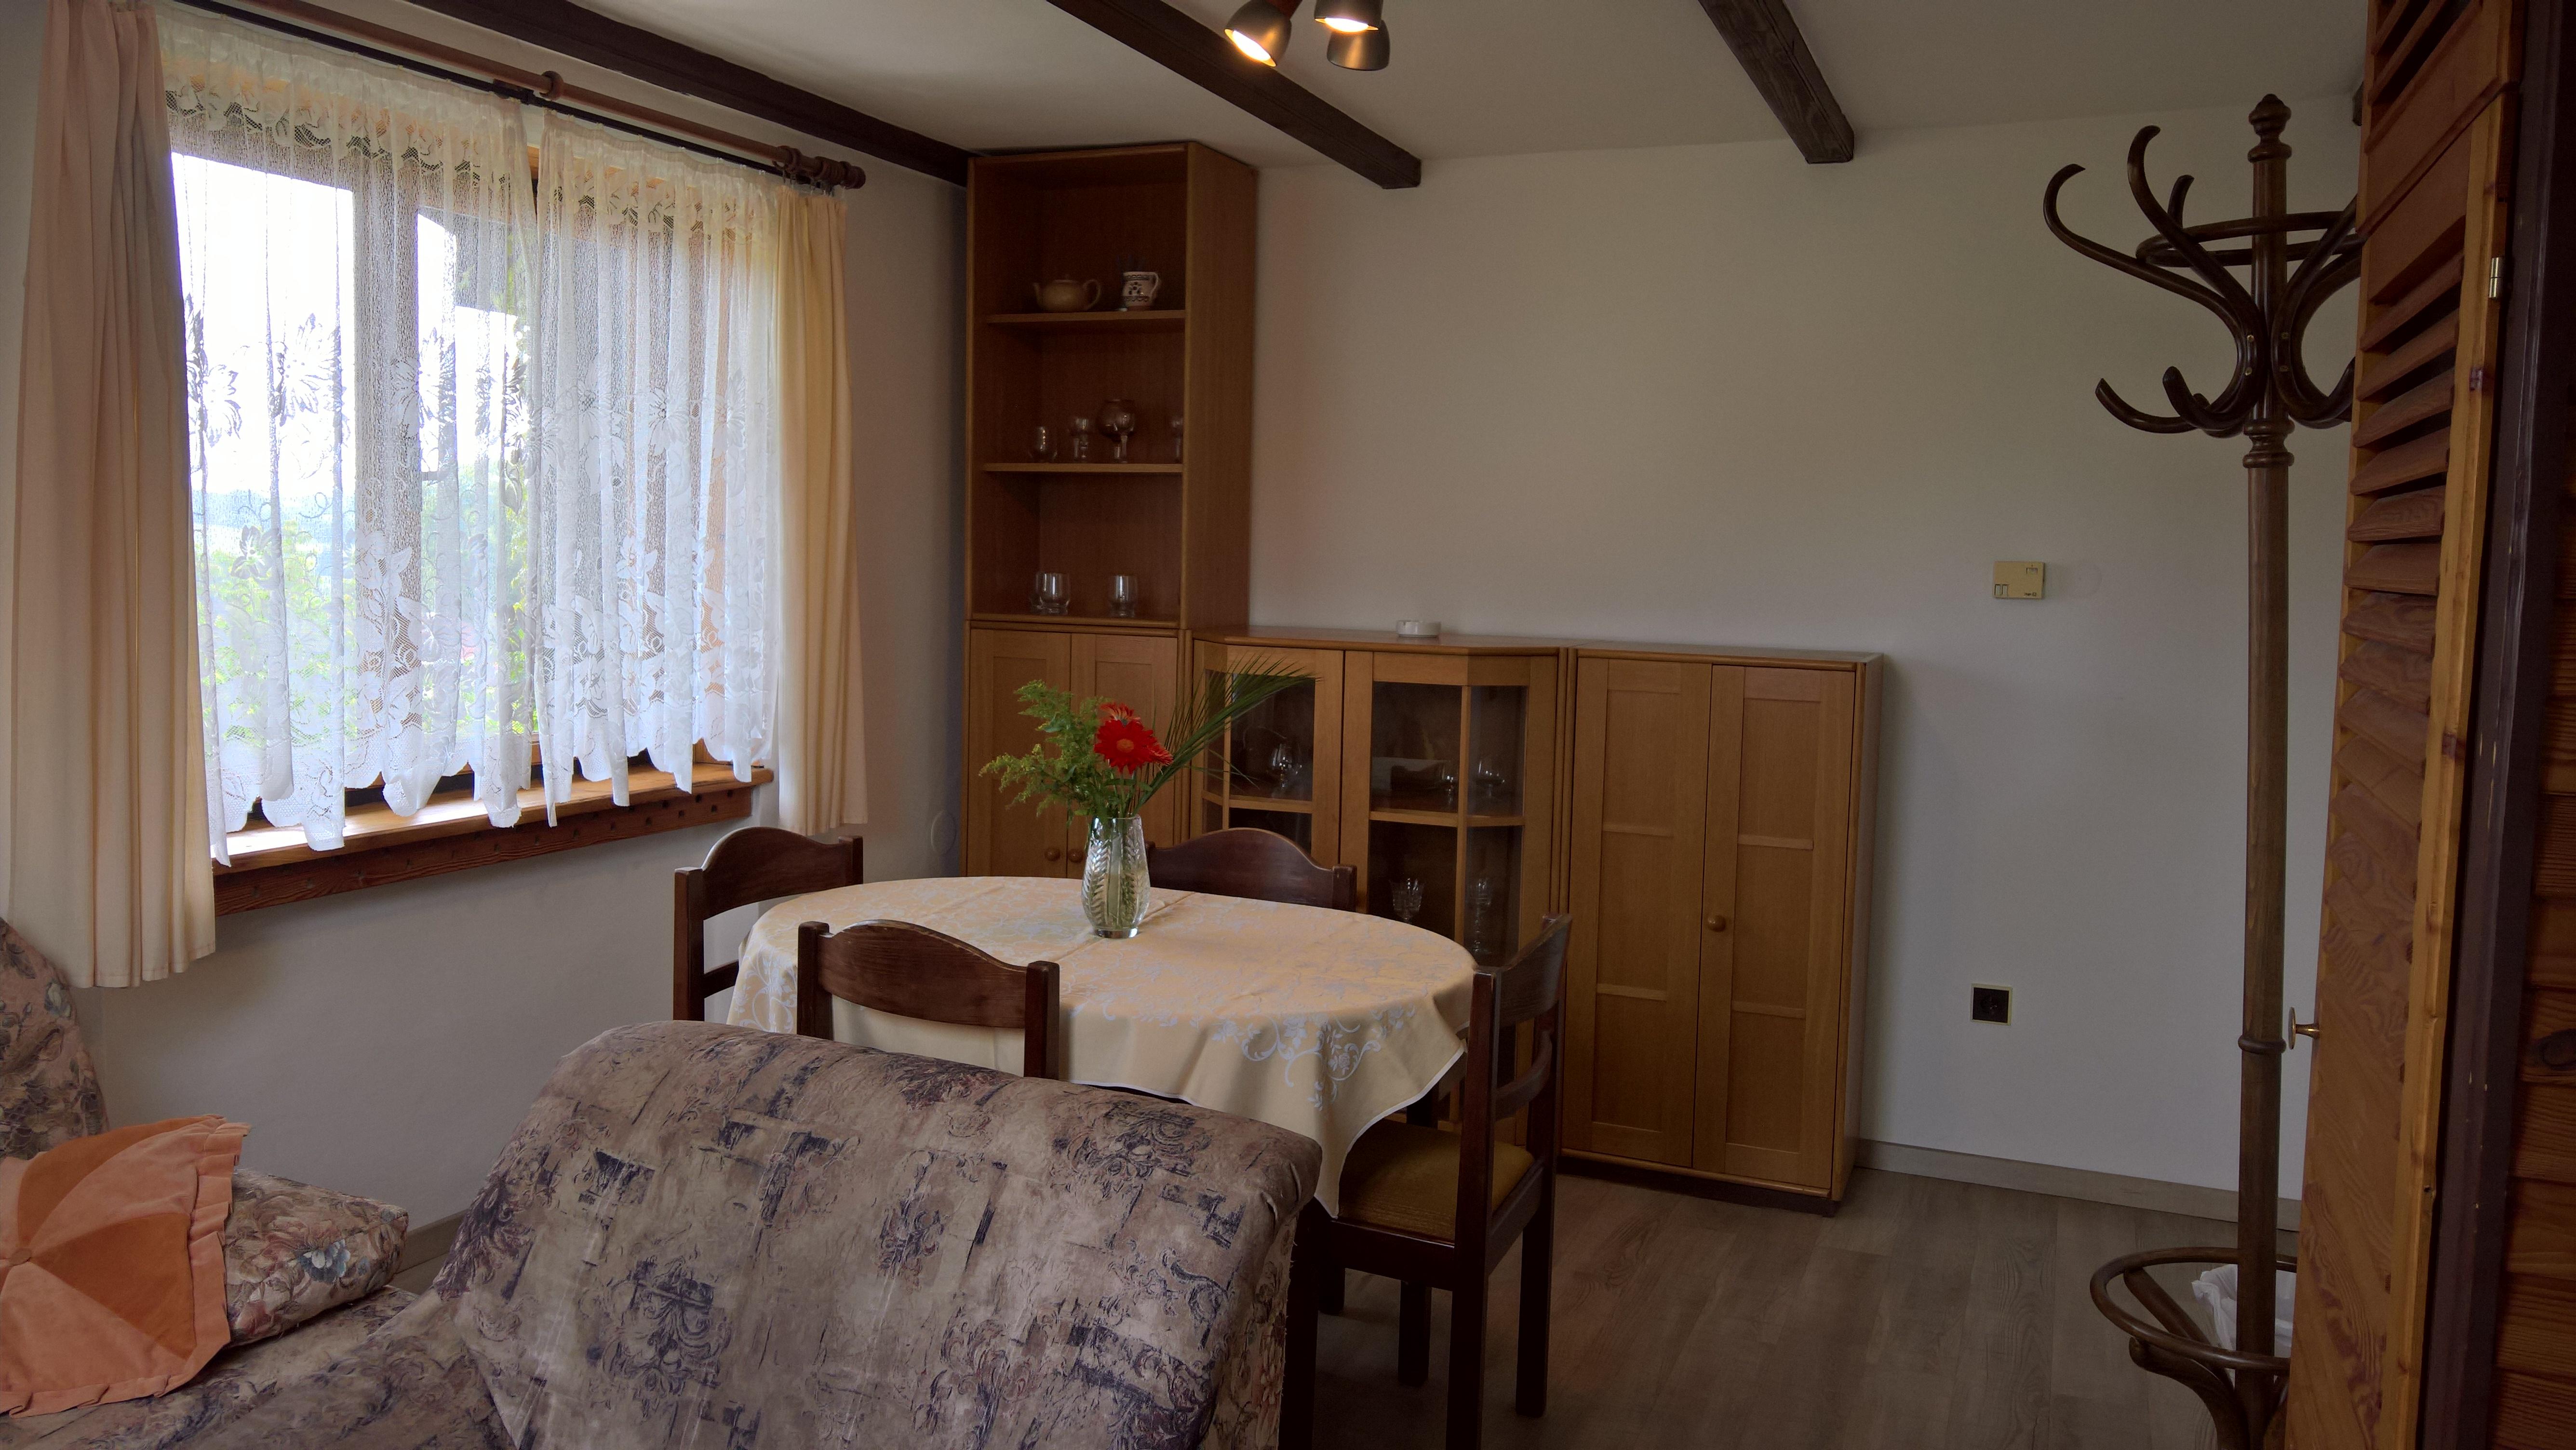 Privat-apartma-ulrych-apartma-1-4